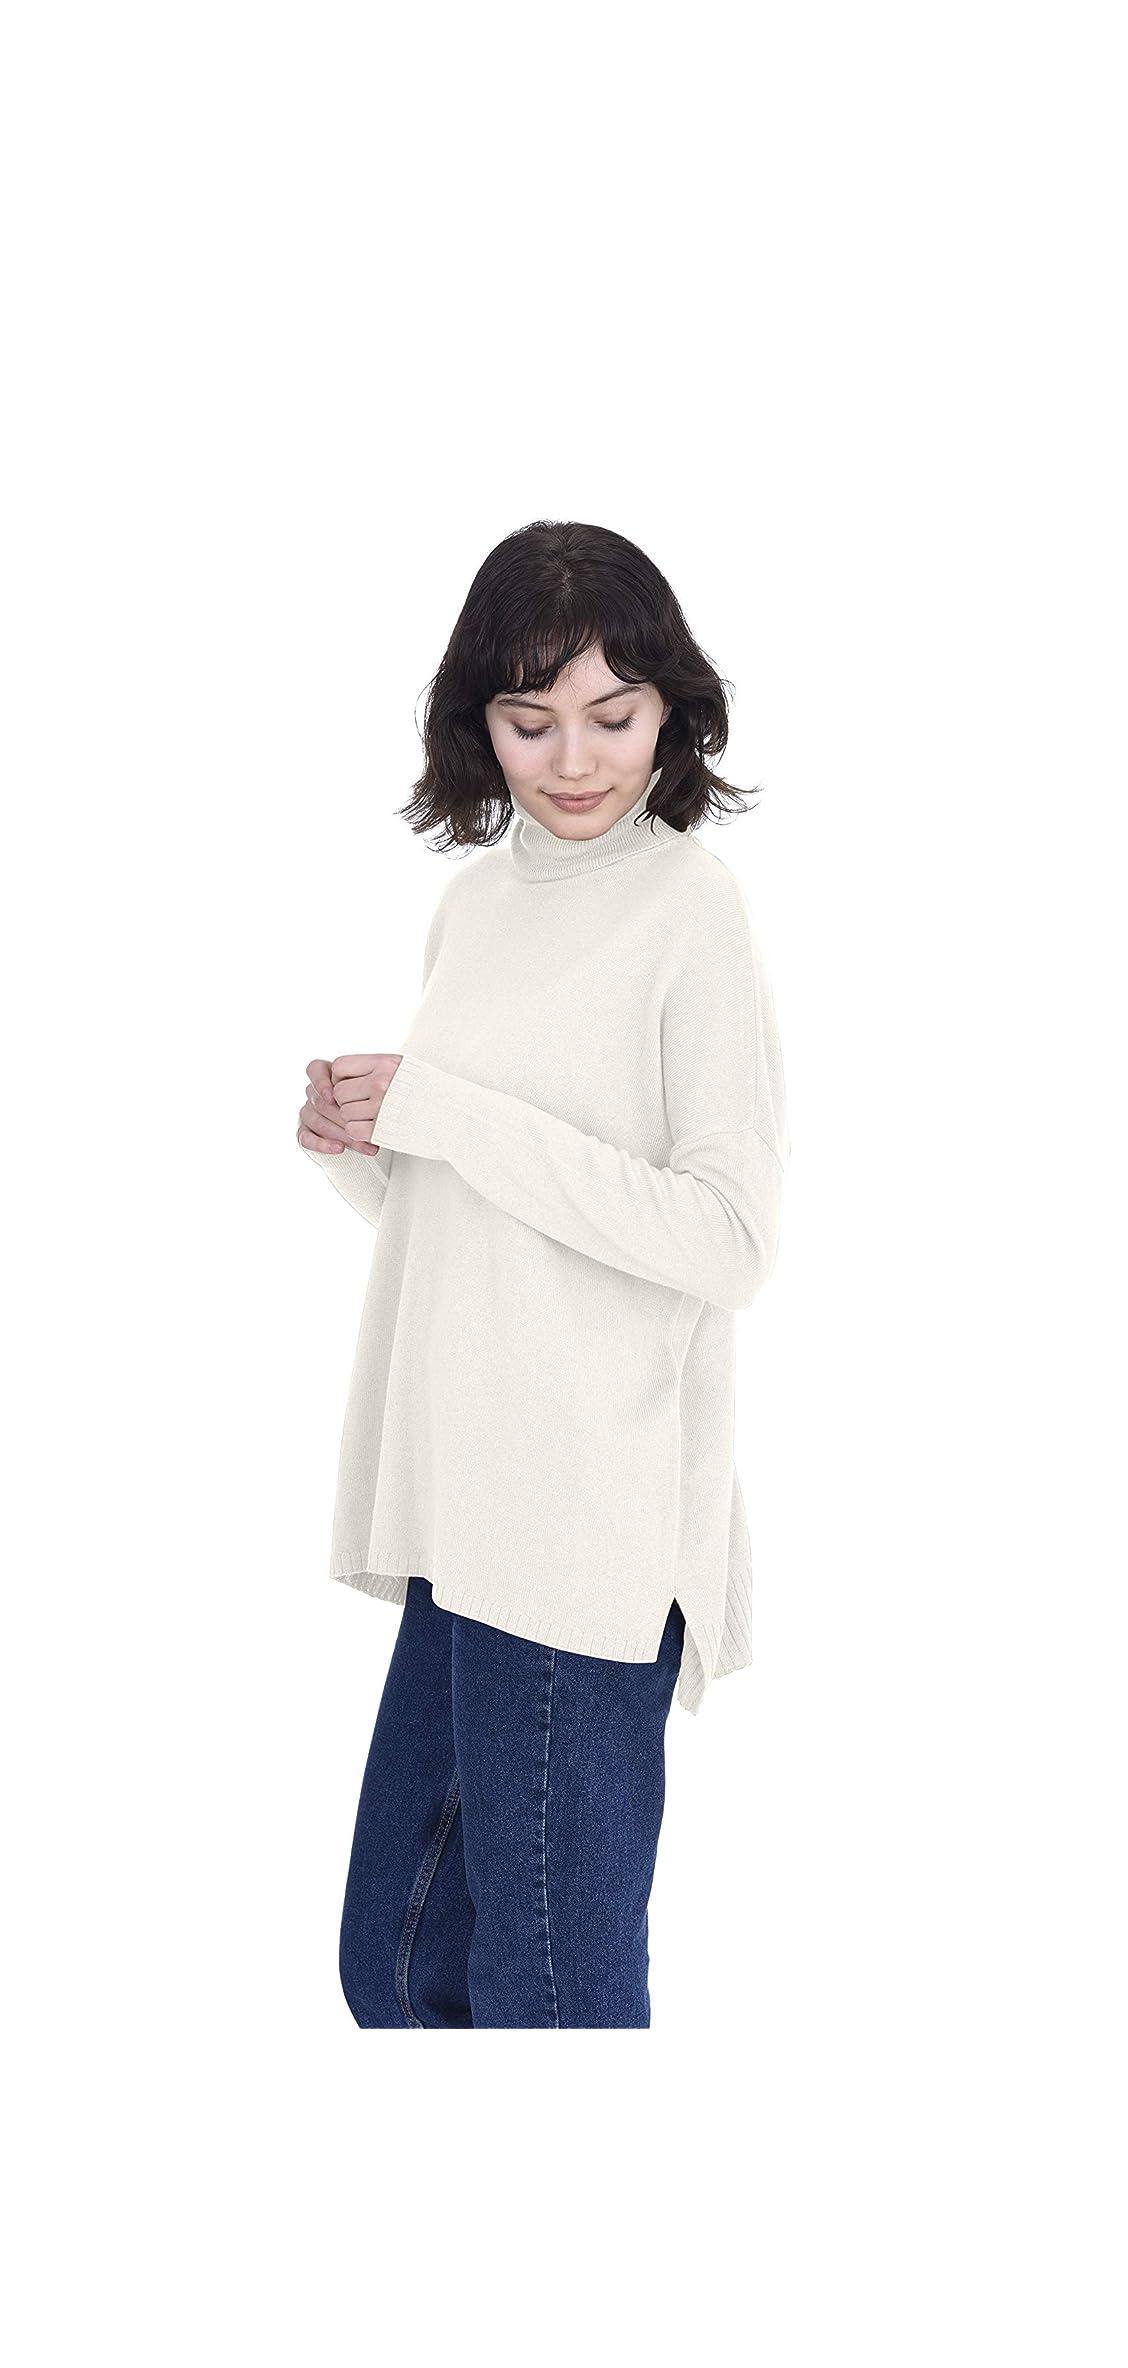 Oversized Tunic Side Slits Turtleneck Pullover